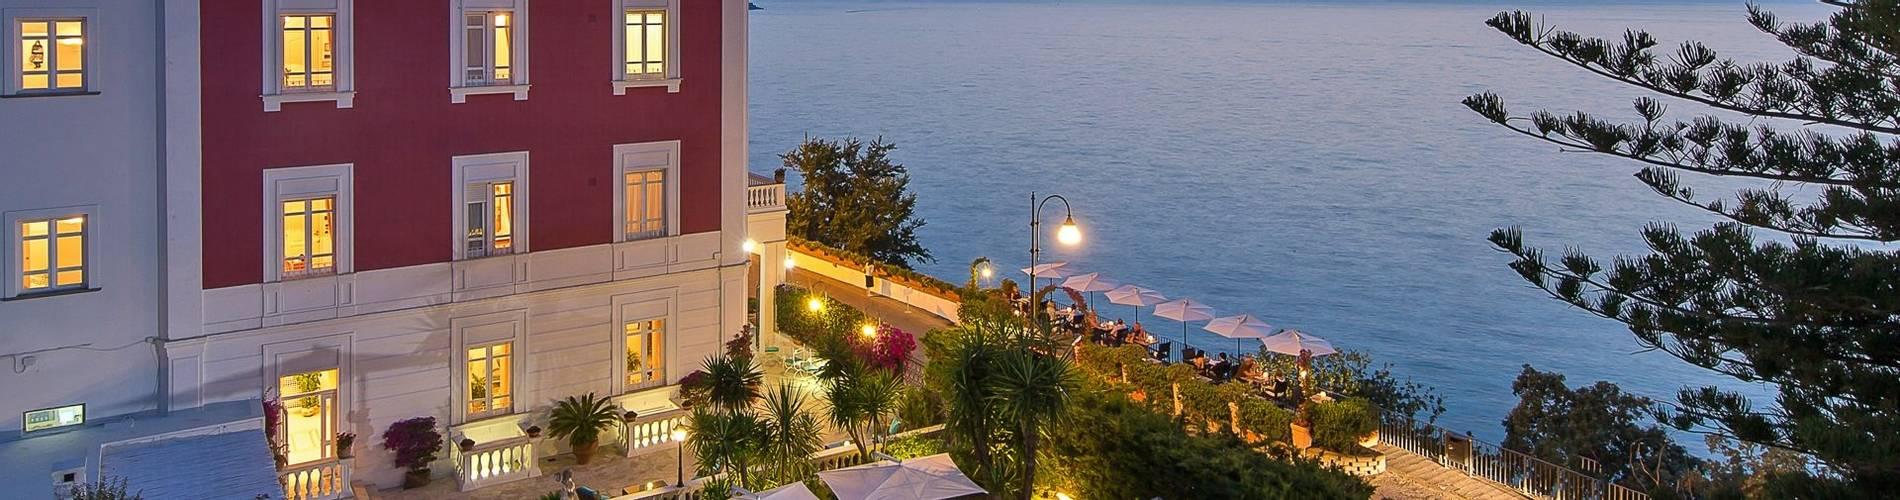 Villa Garden, Amalfi, Italy (15).jpg